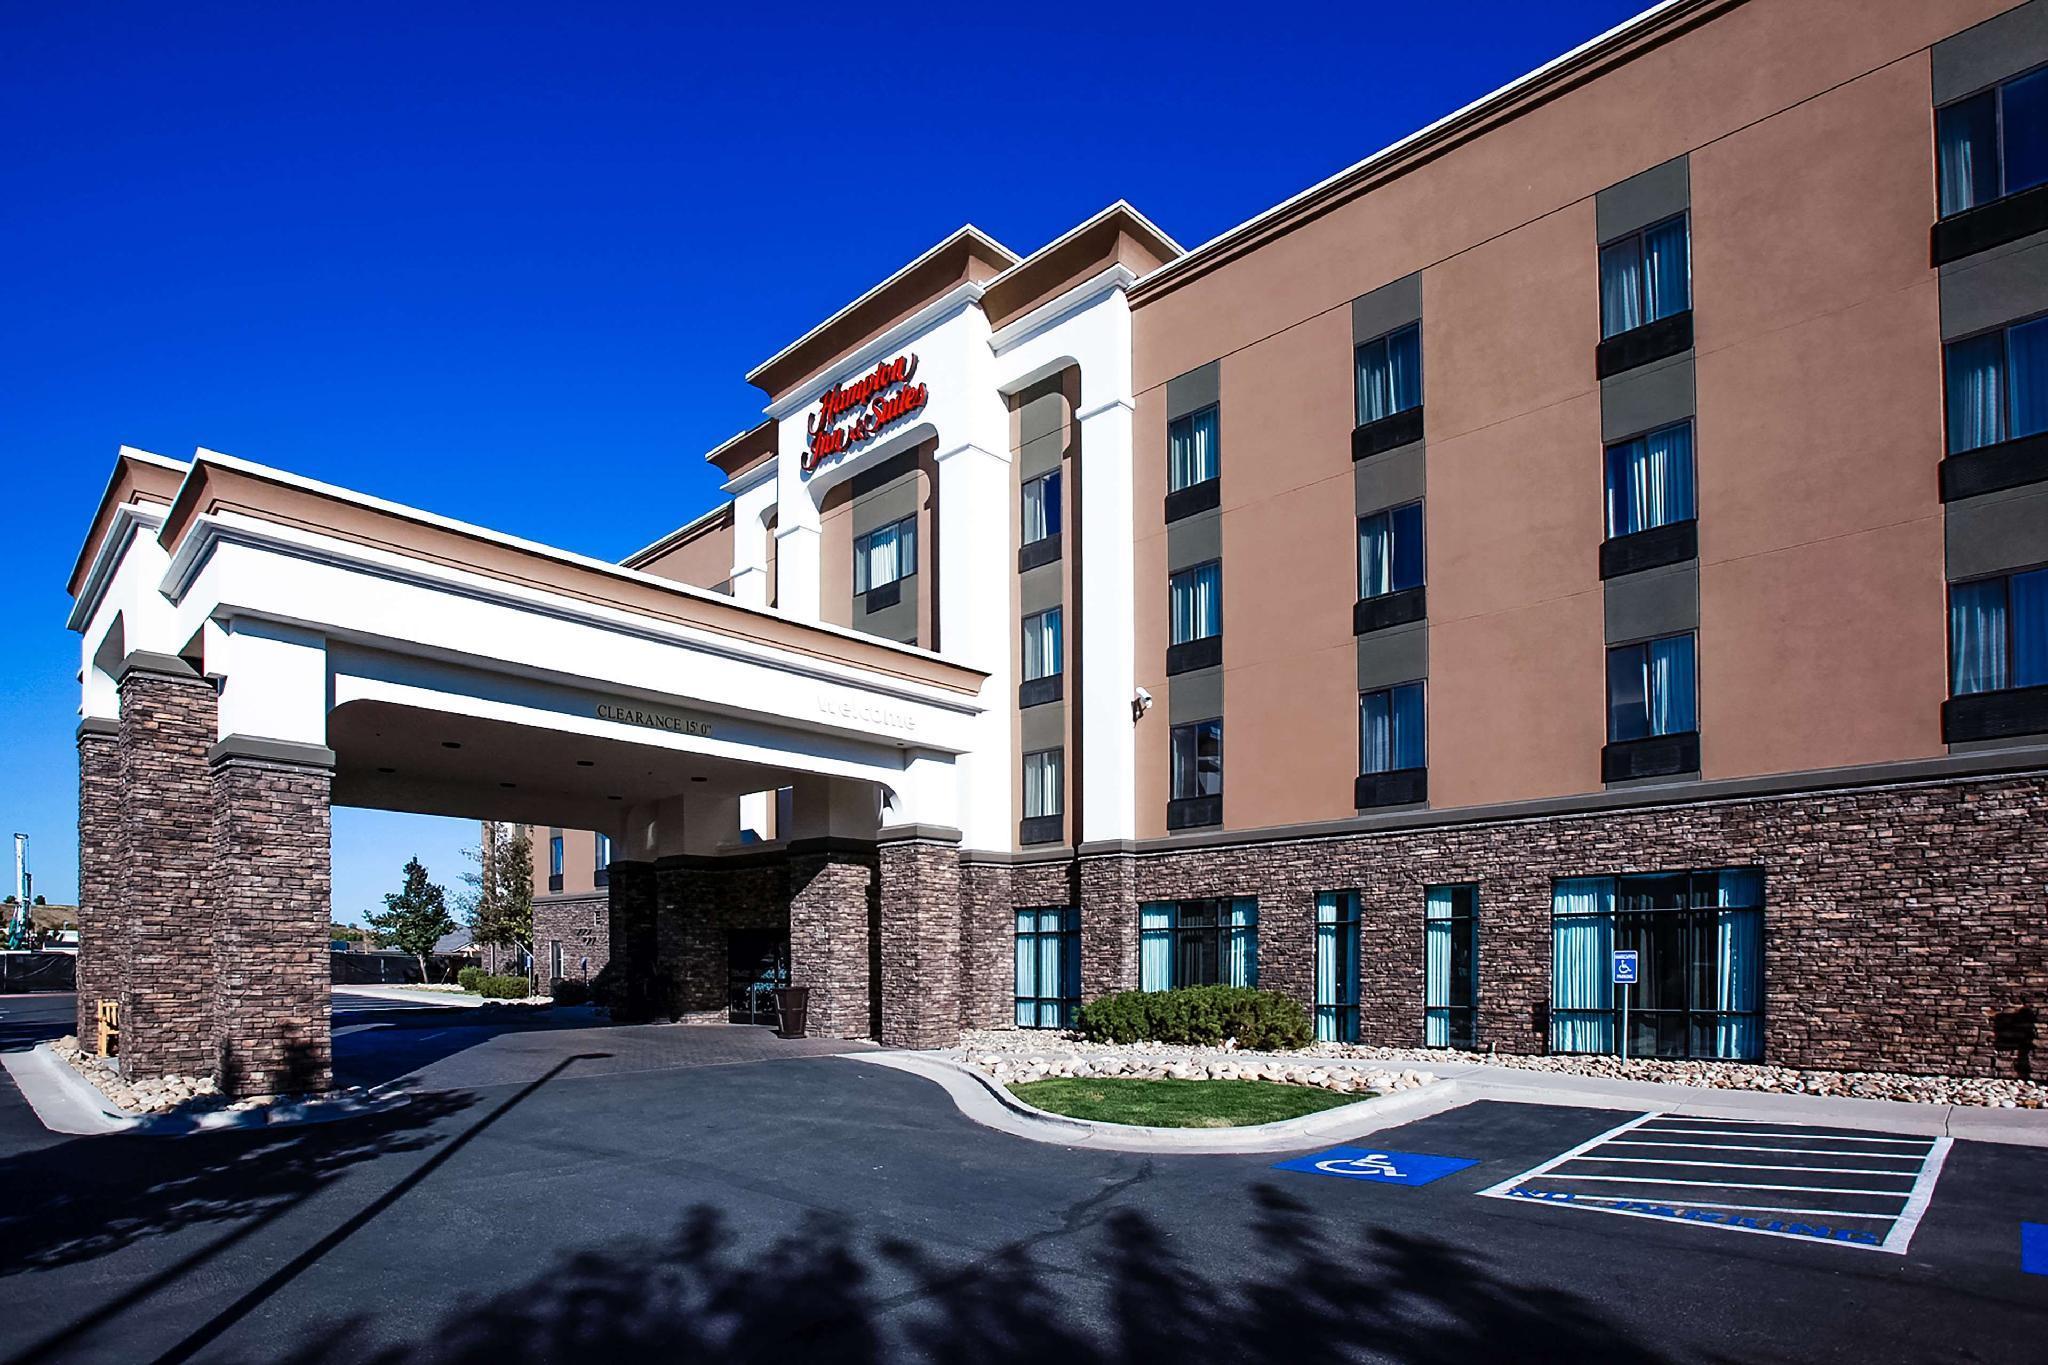 Hampton Inn And Suites Nampa @ Idaho Center